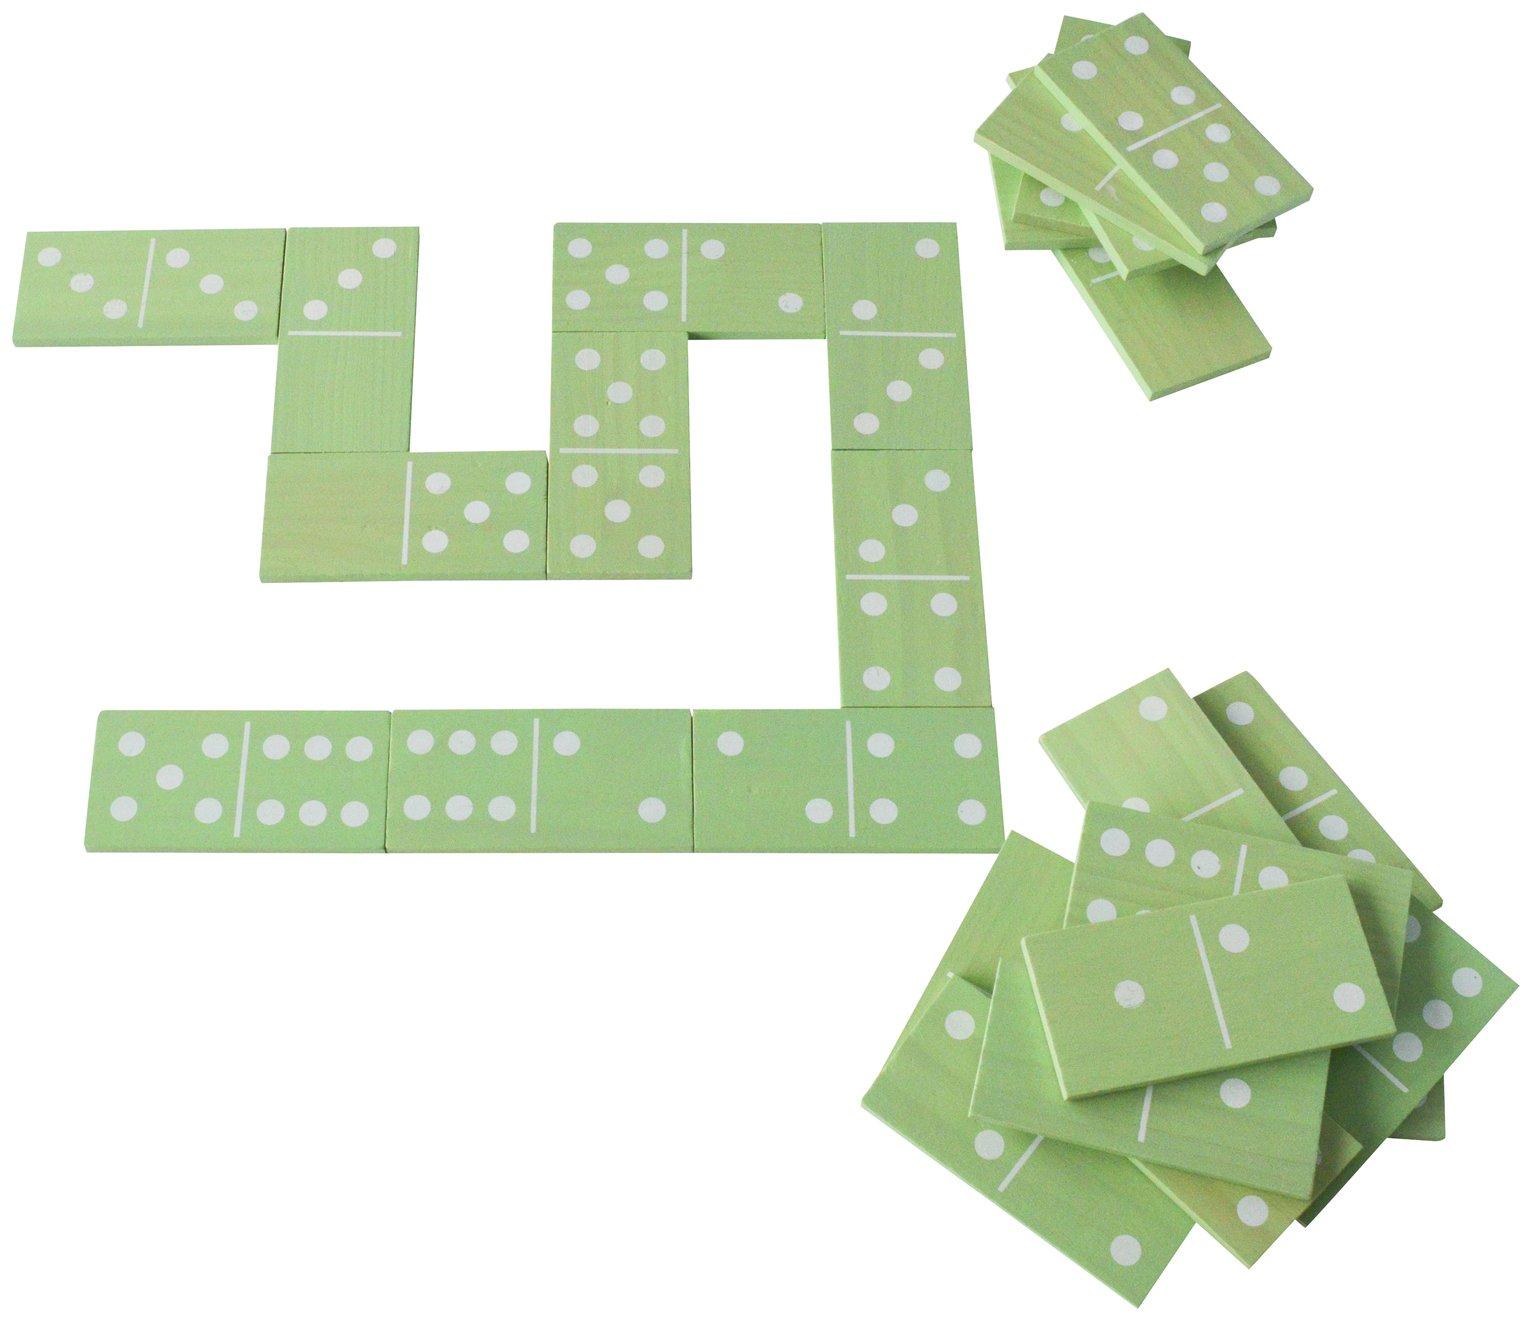 Traditional Garden Games Wooden Dominos Set